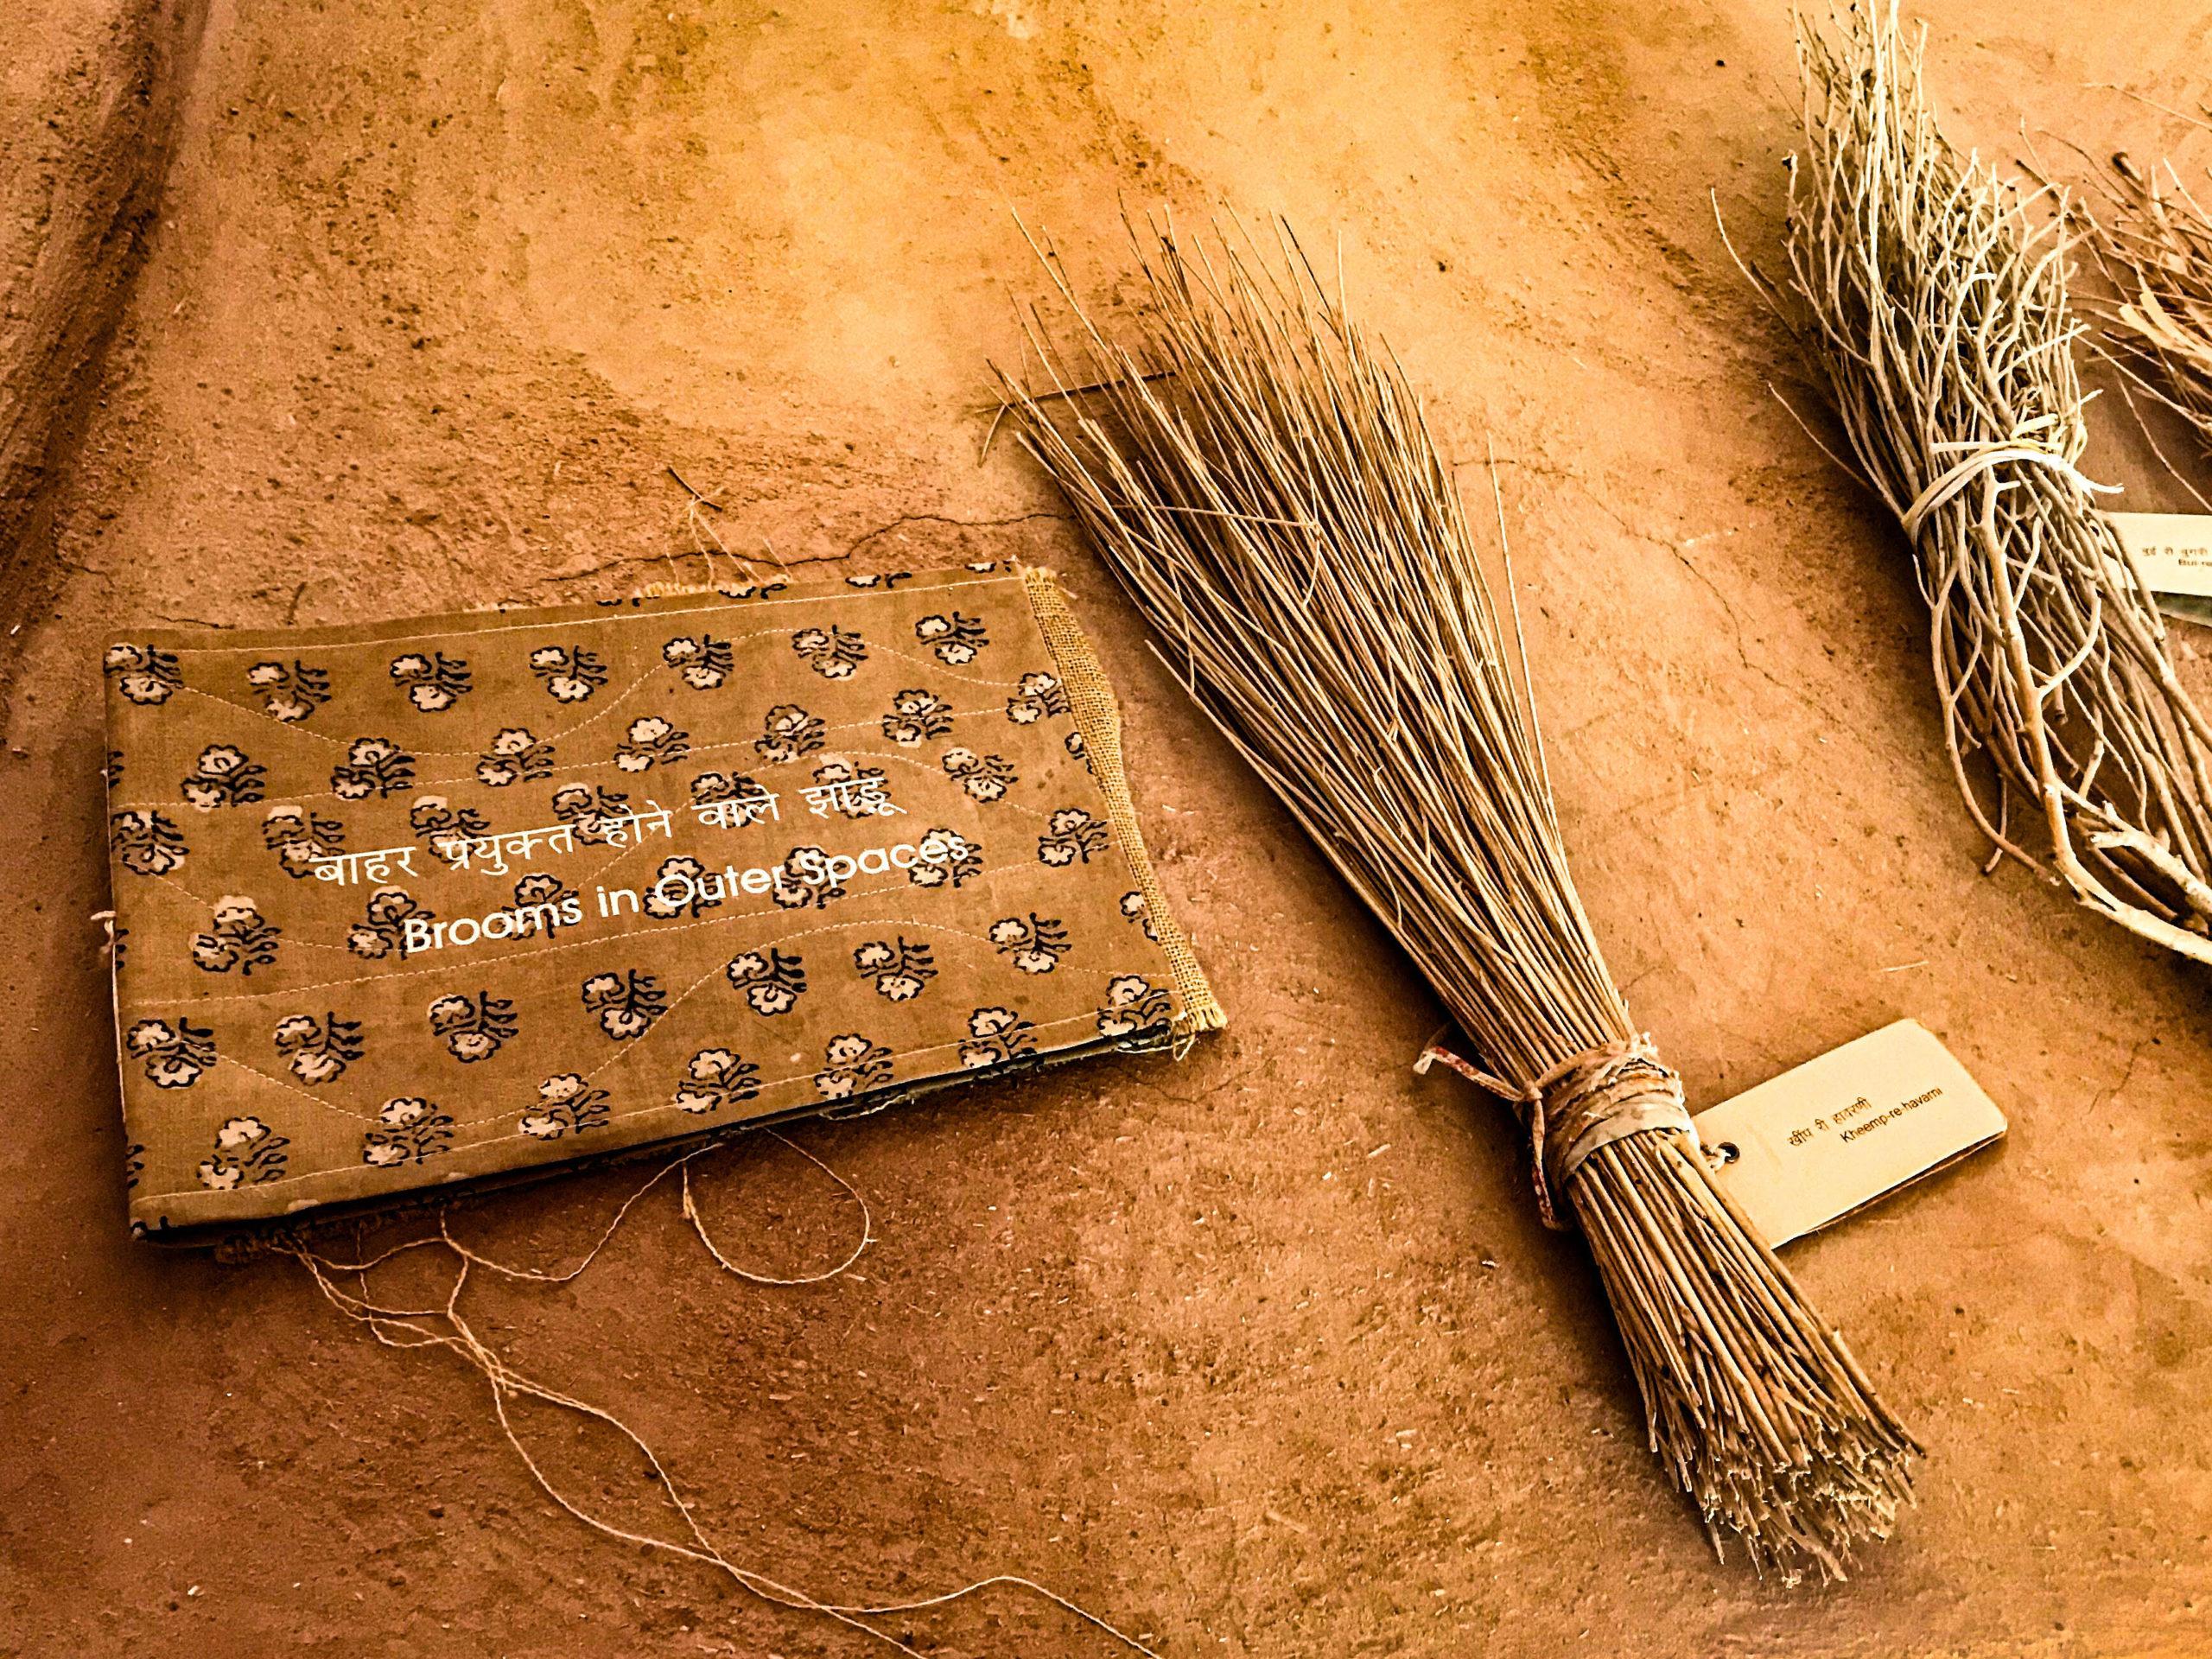 Broom museum